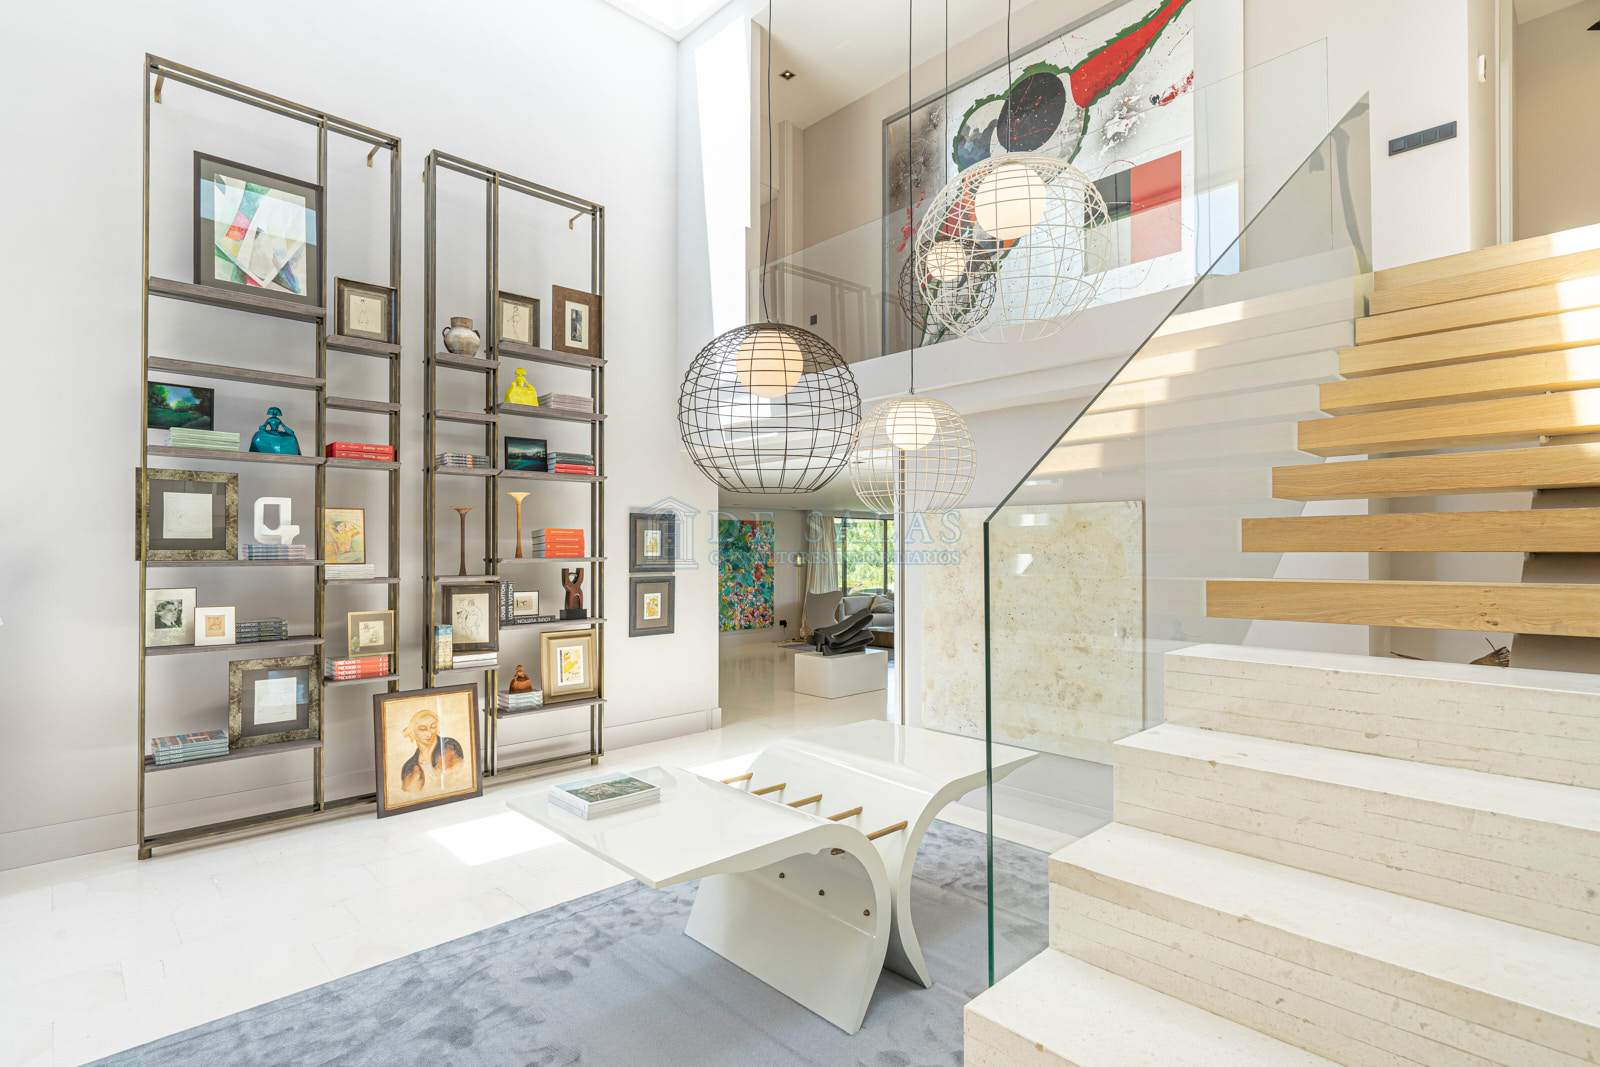 Escalera-0020 House La Moraleja